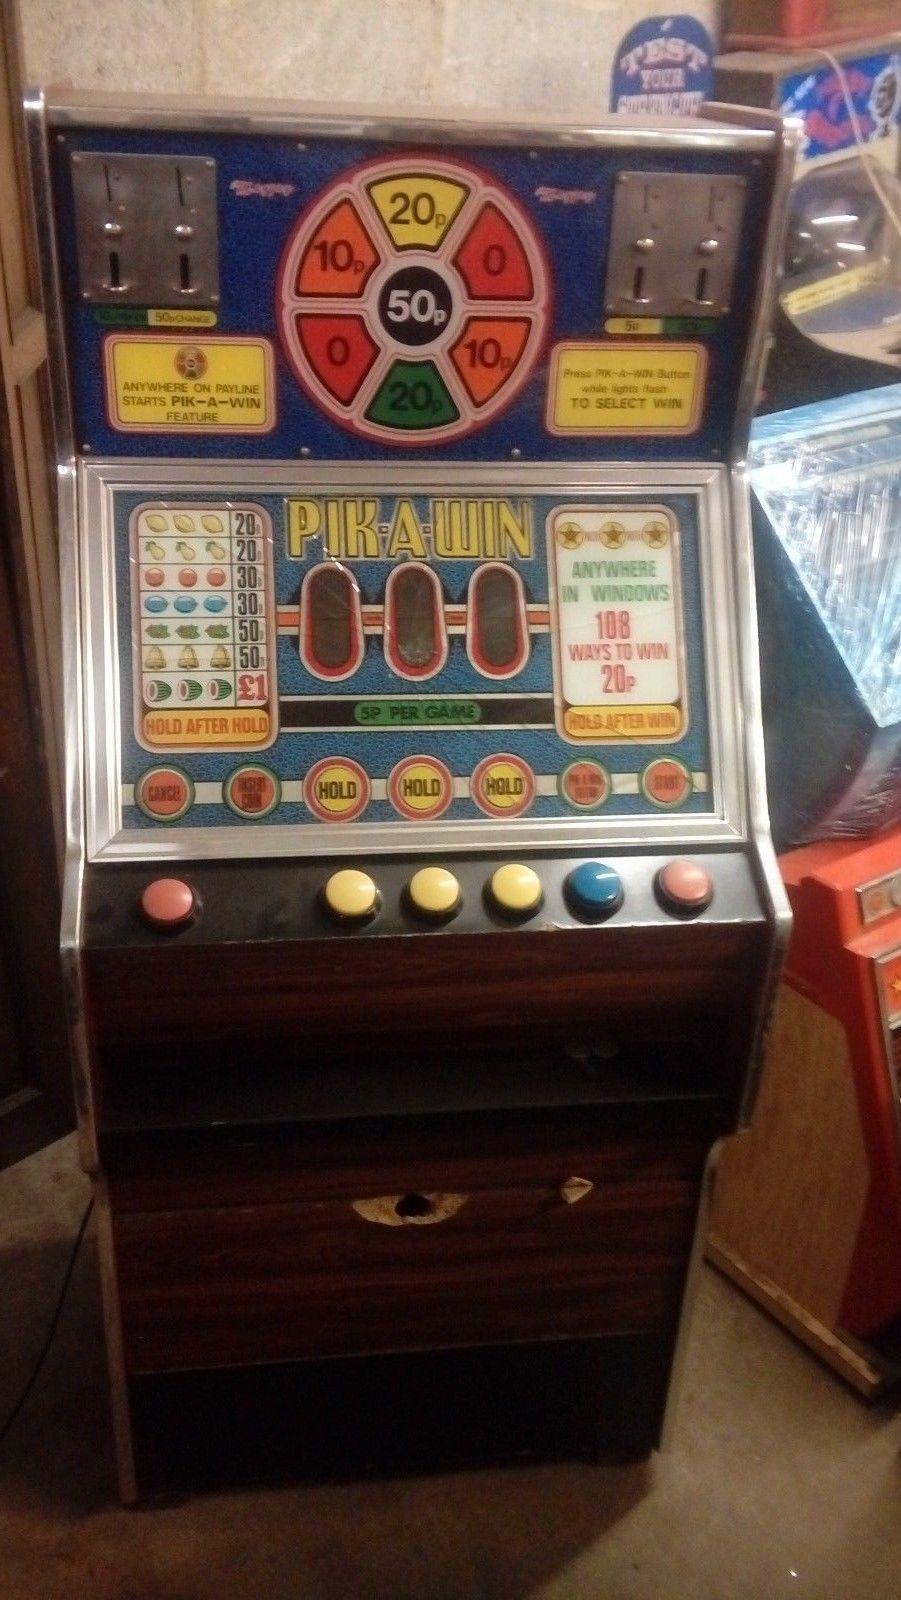 Maygay PikAWin fruit machine, 5p/play with a £1 jackpot